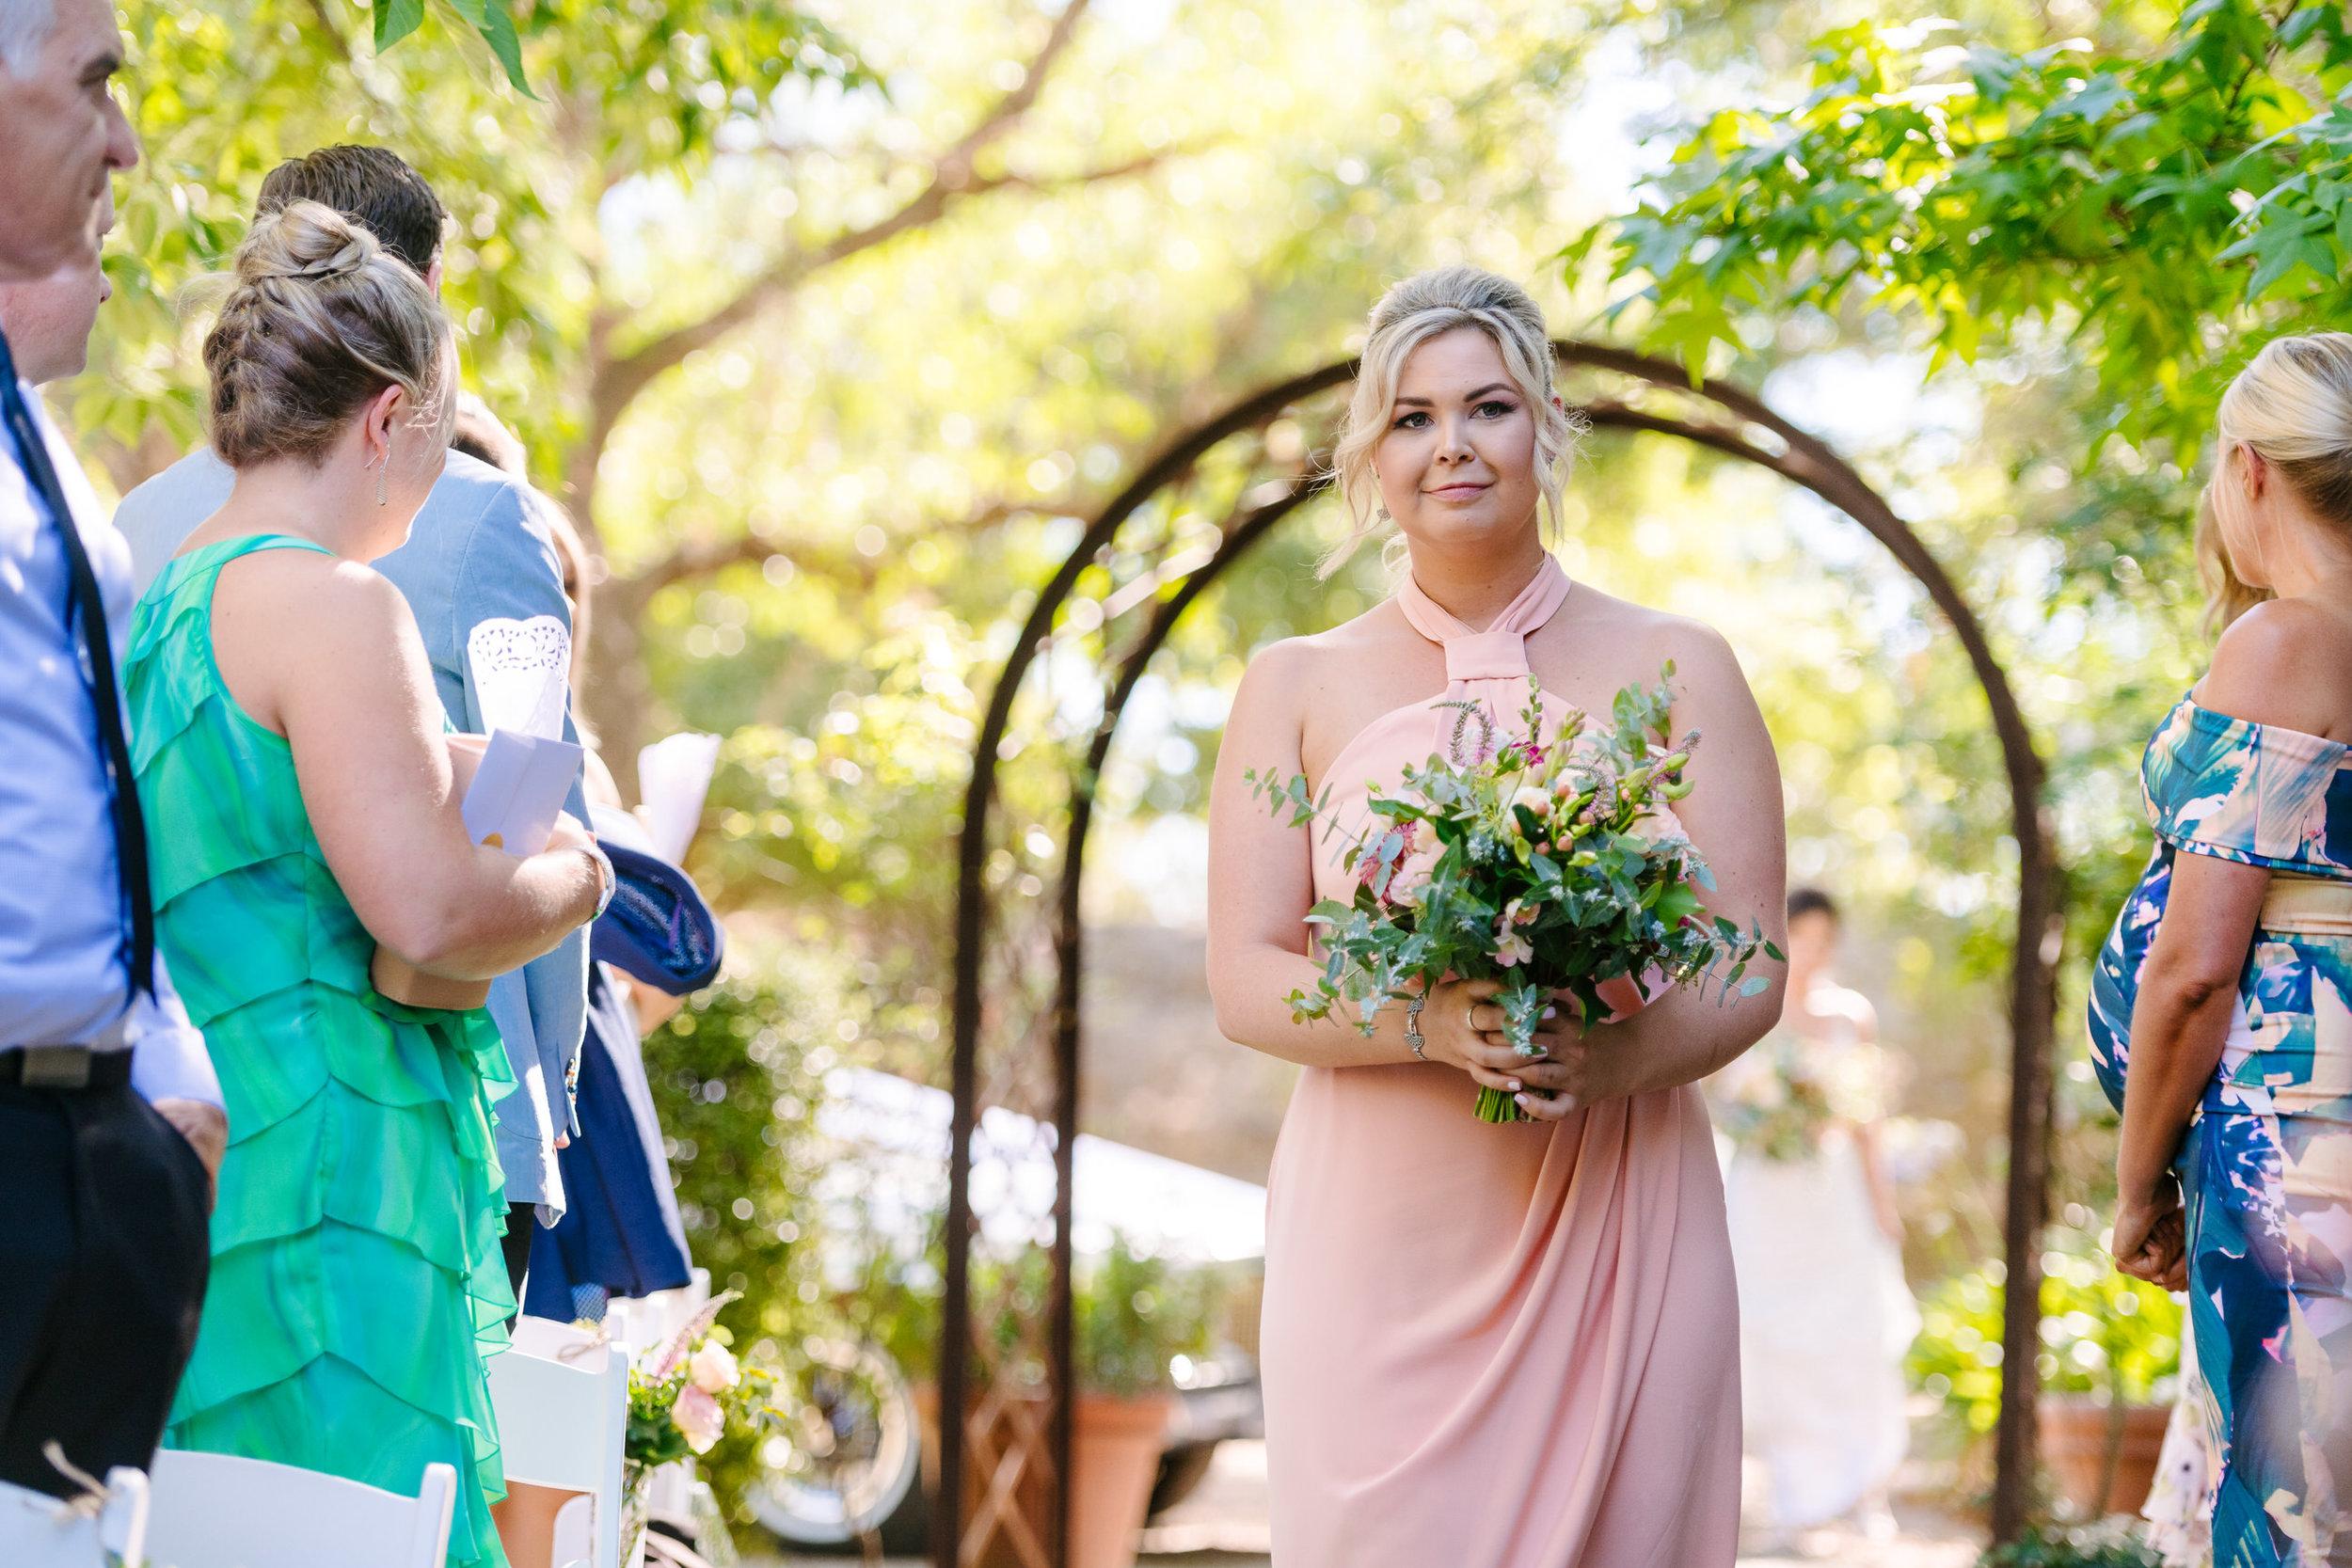 Justin_And_Jim_Photography_Chateau_Dore_Bendigo_Wedding28.JPG